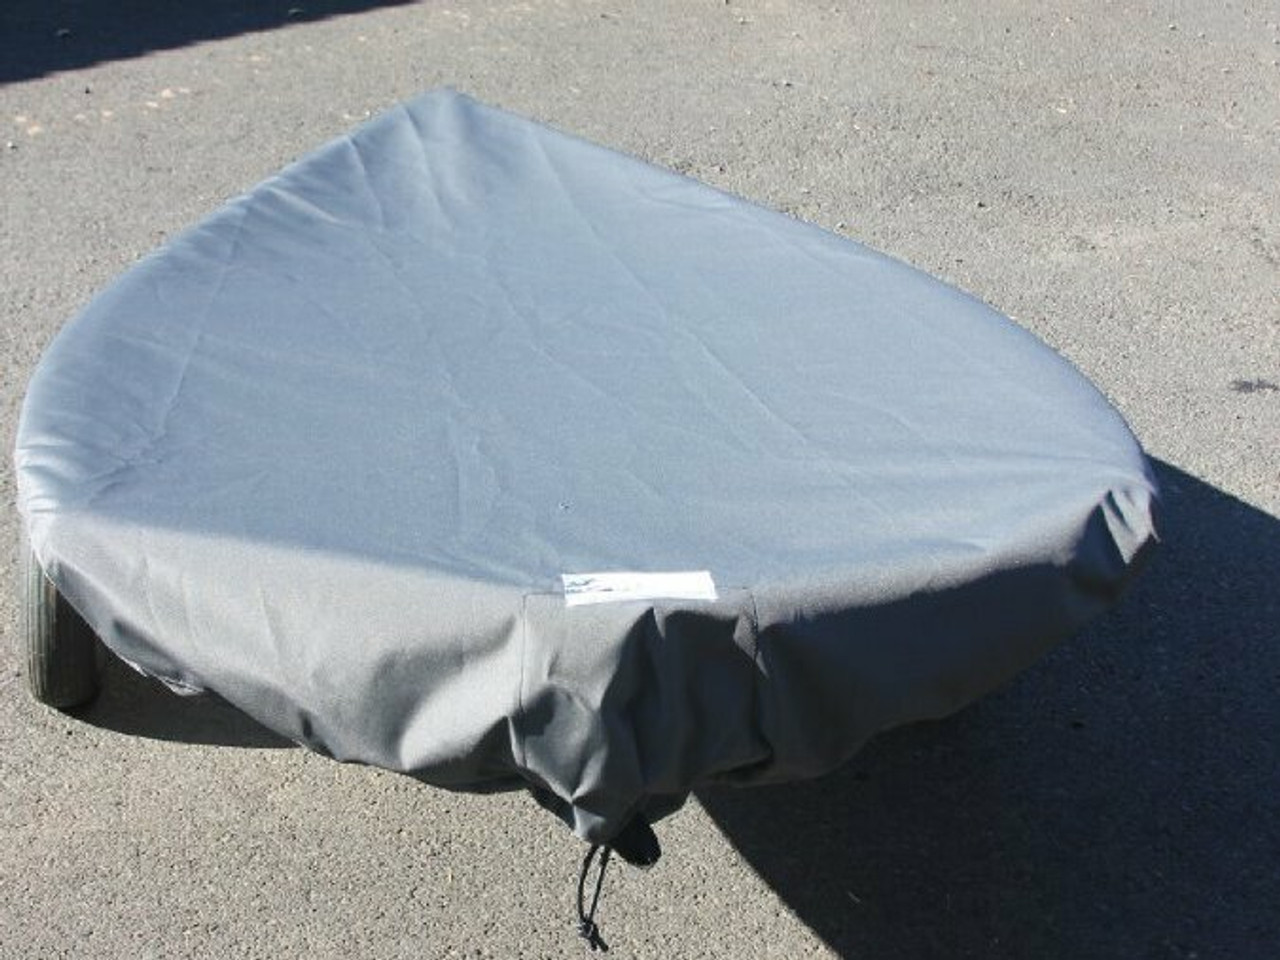 O'Pen Bic Sailboat Top Cover - Deck Cover (20041231)